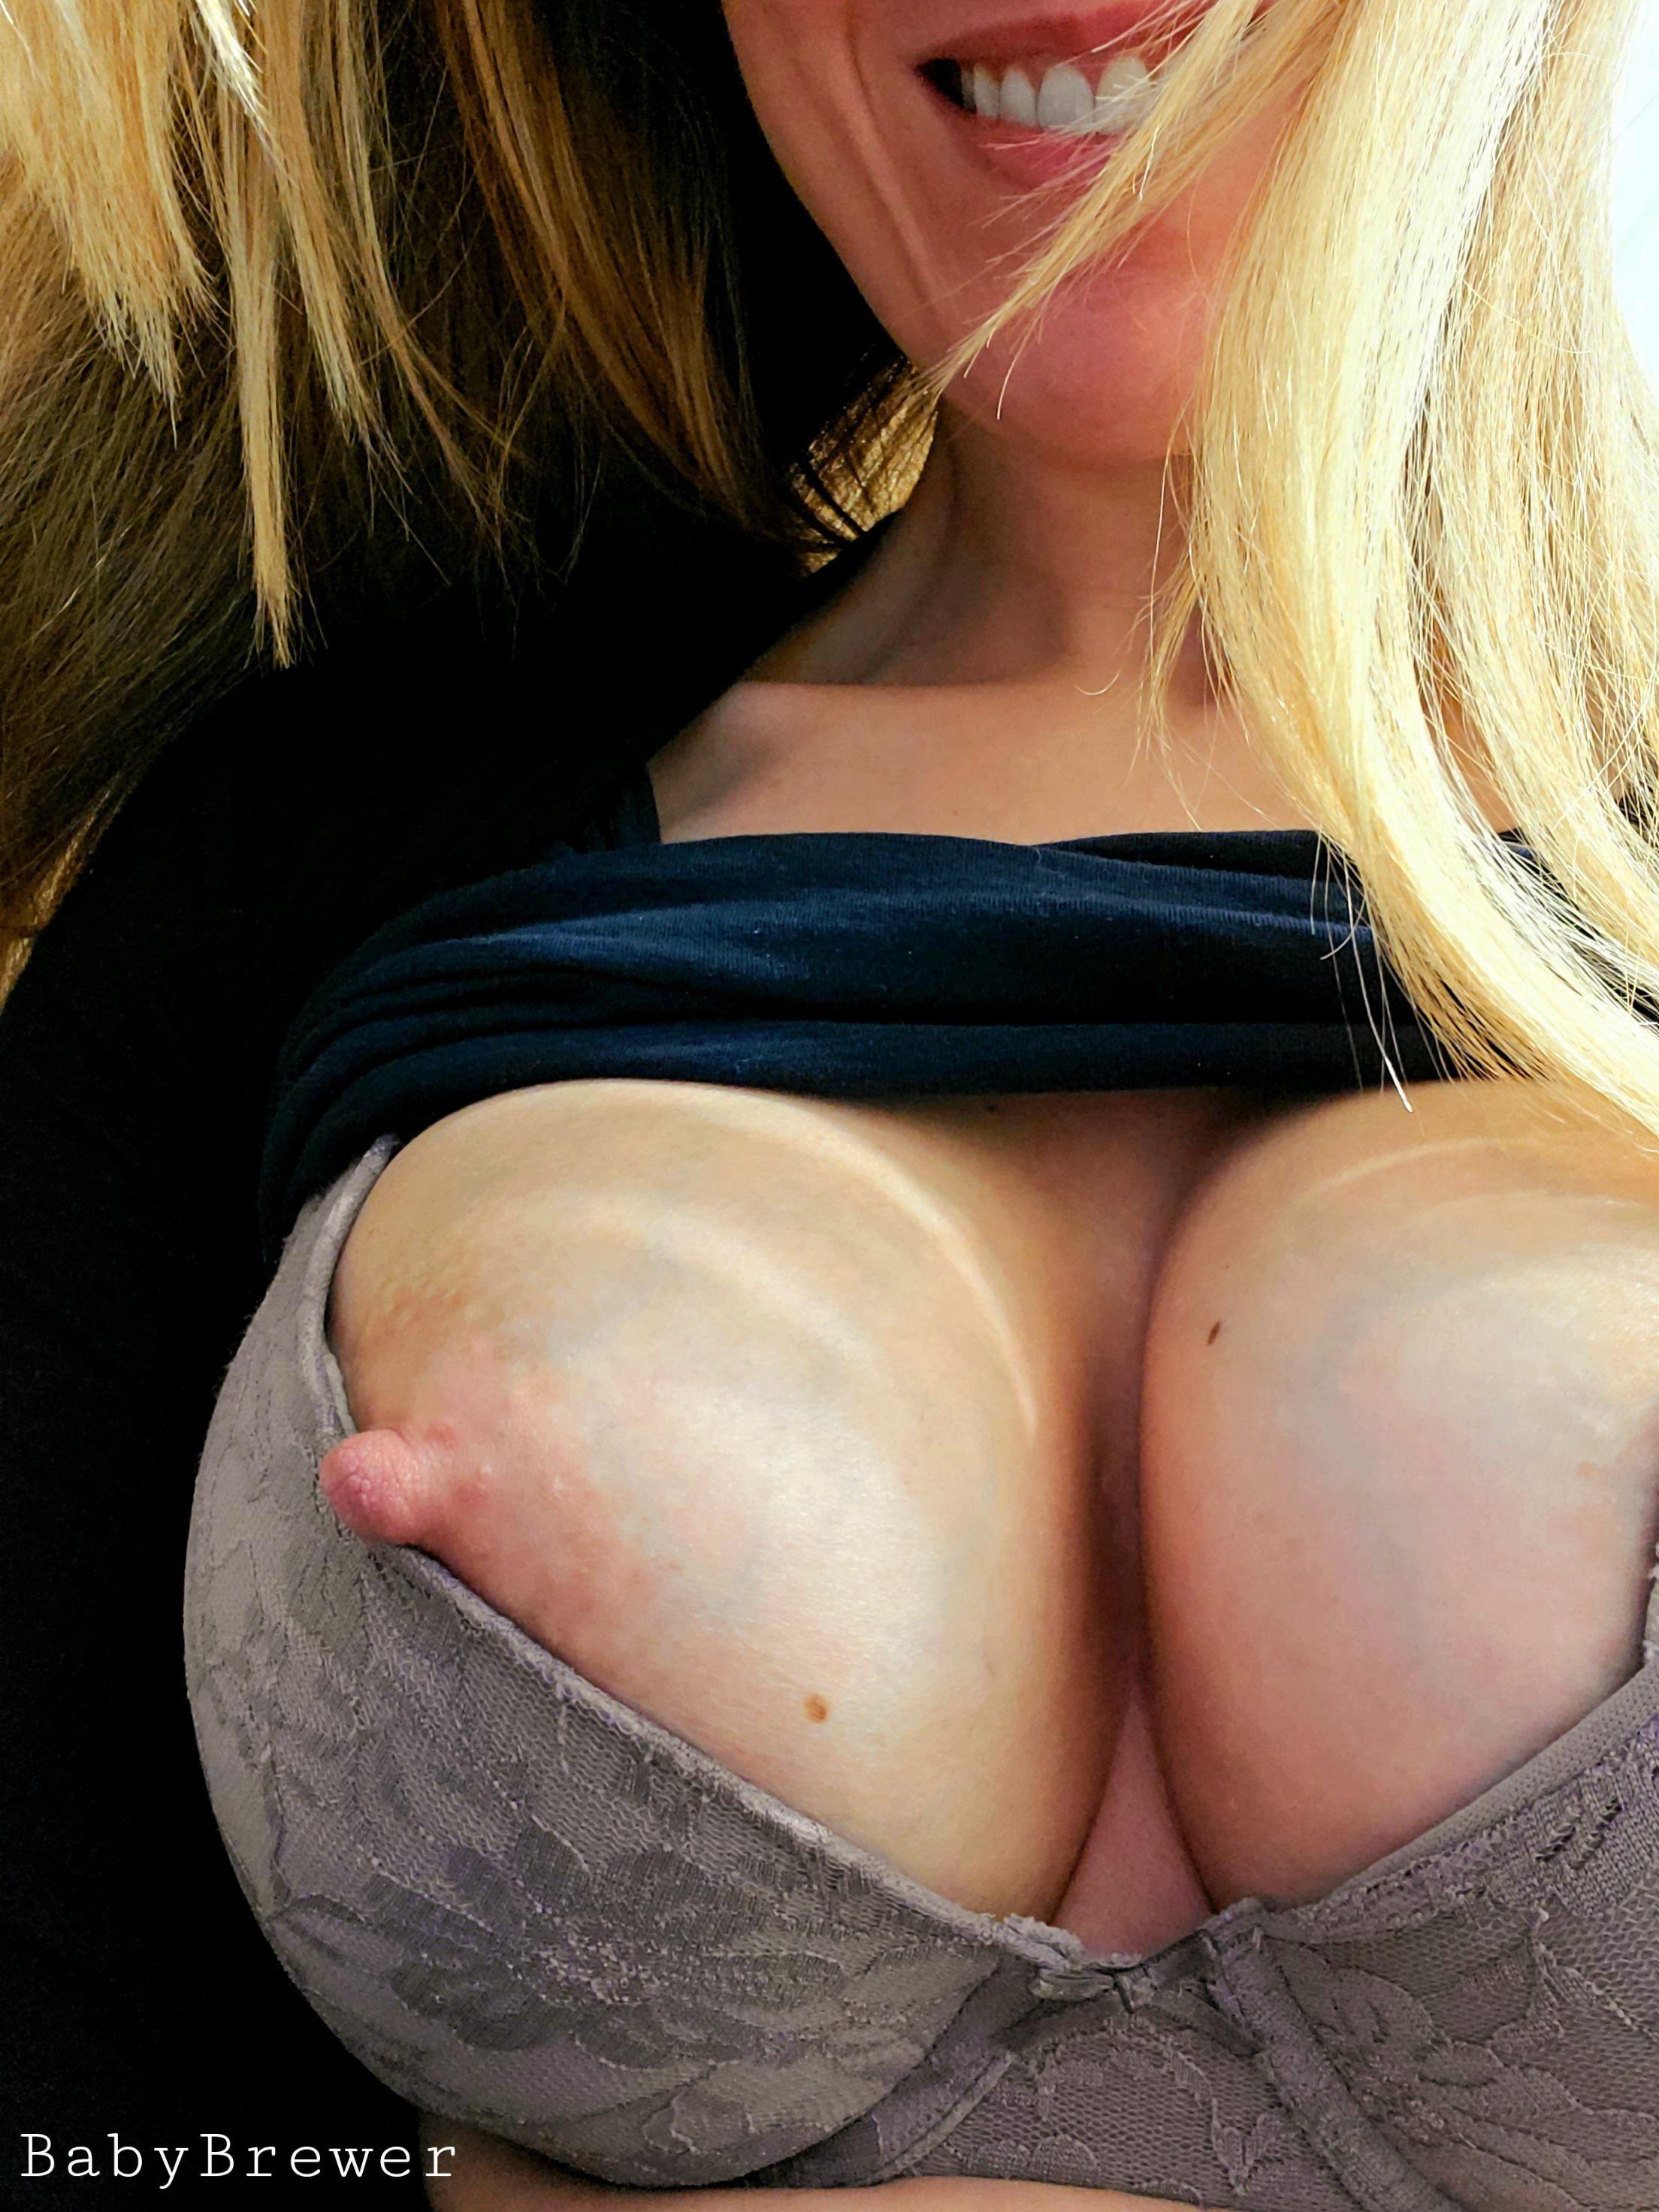 Bra big nipples A Bra Too Small A Nipple Too Big Shemale 7